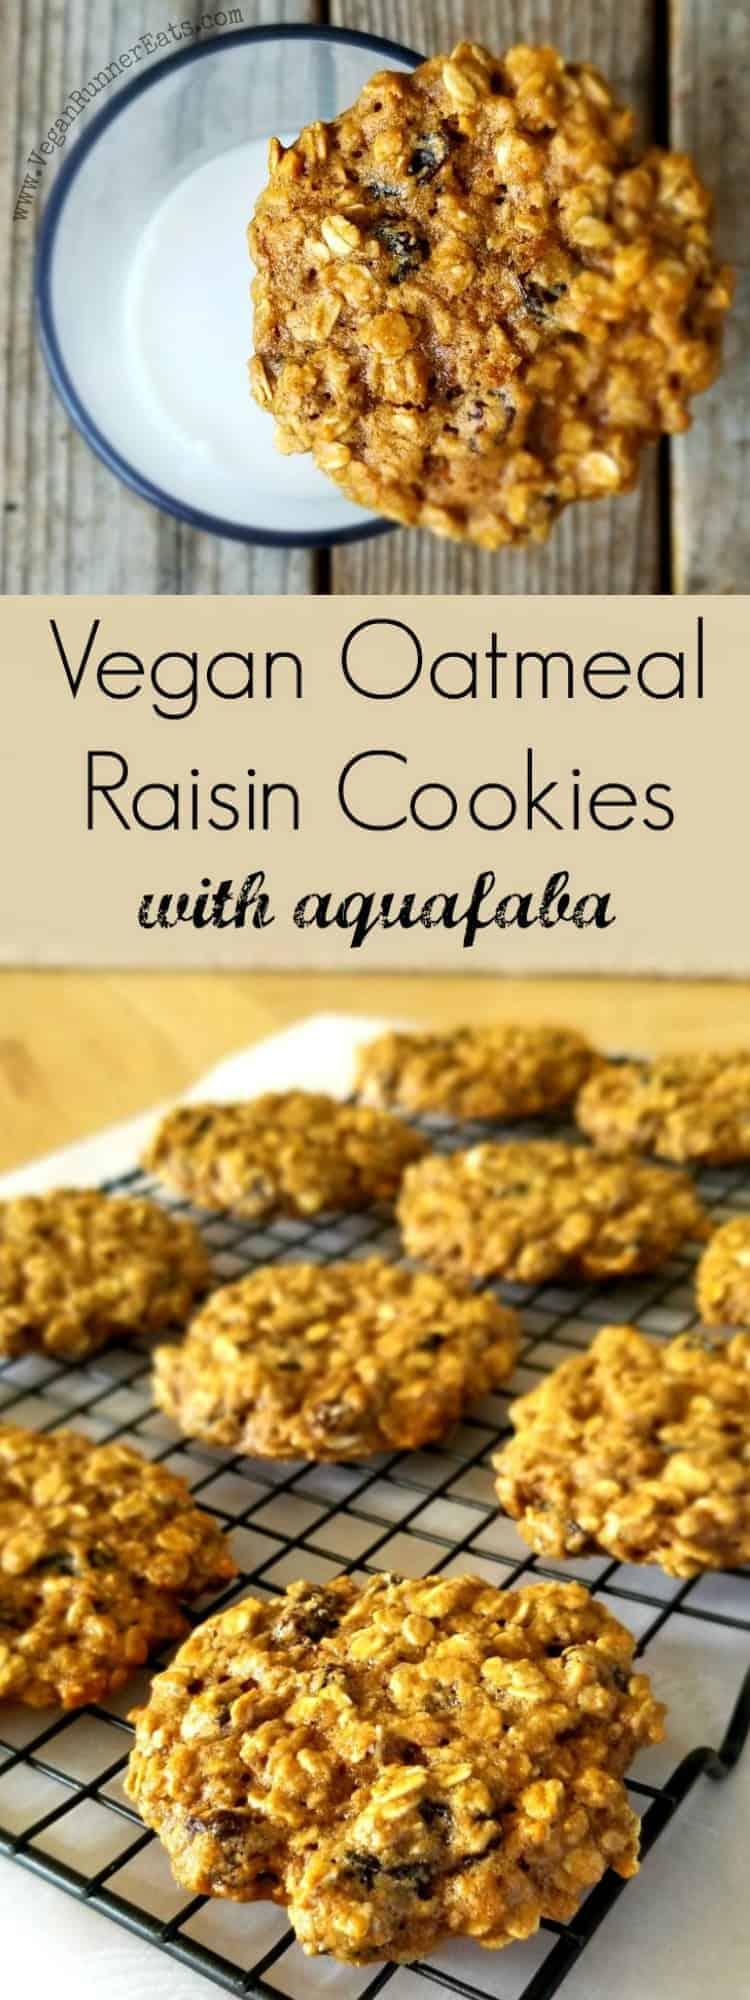 Vegan Oatmeal Raisin Cookies Recipe - vegan cookies made with aquafaba